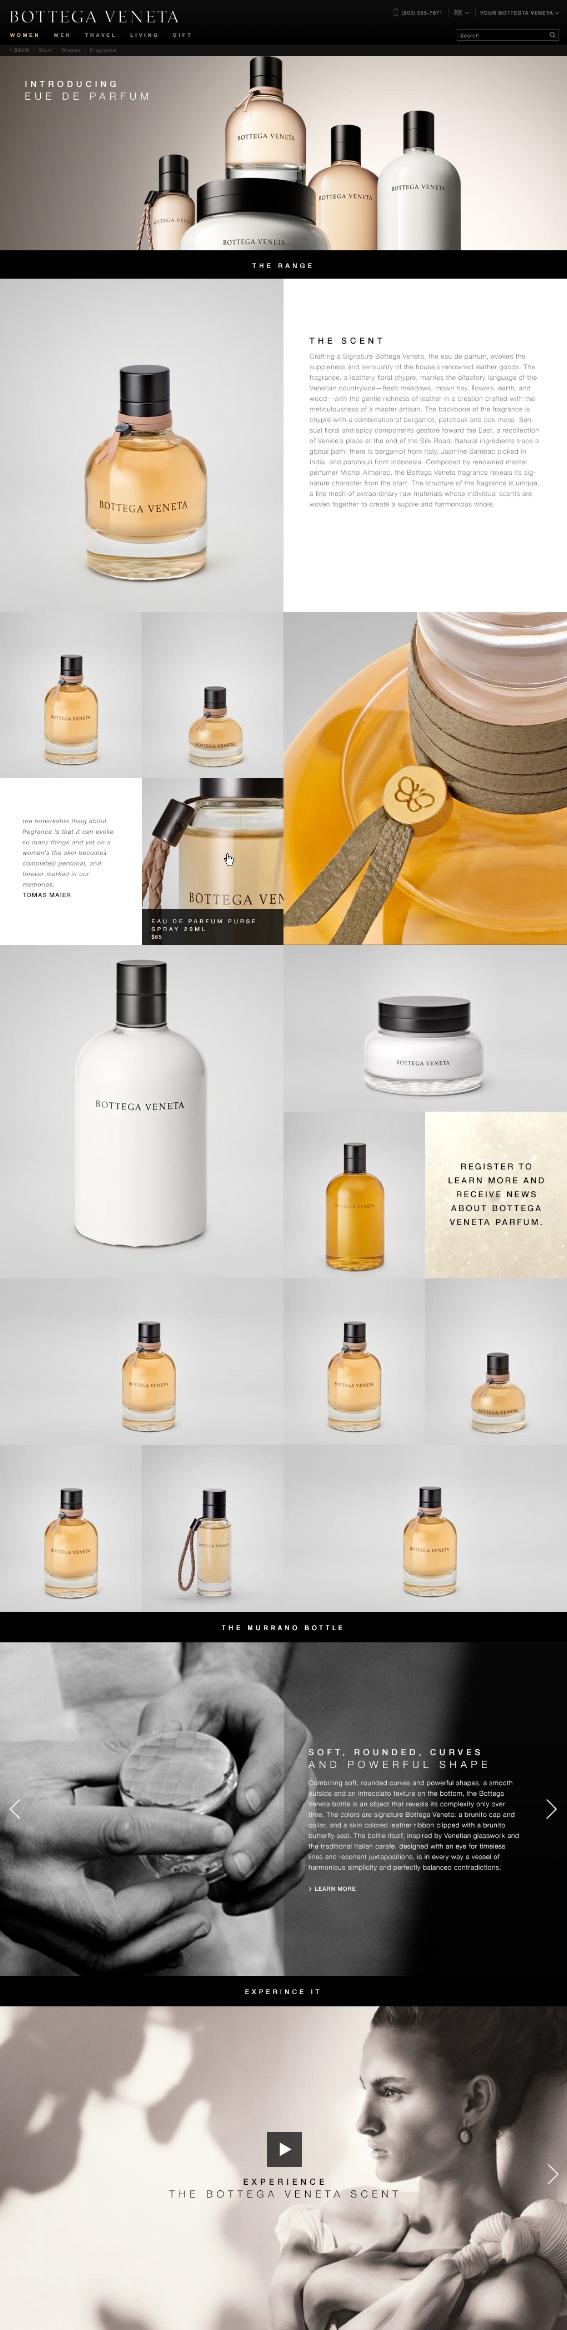 4grid_Fragrance_Editorial-Grid_w_images.jpg